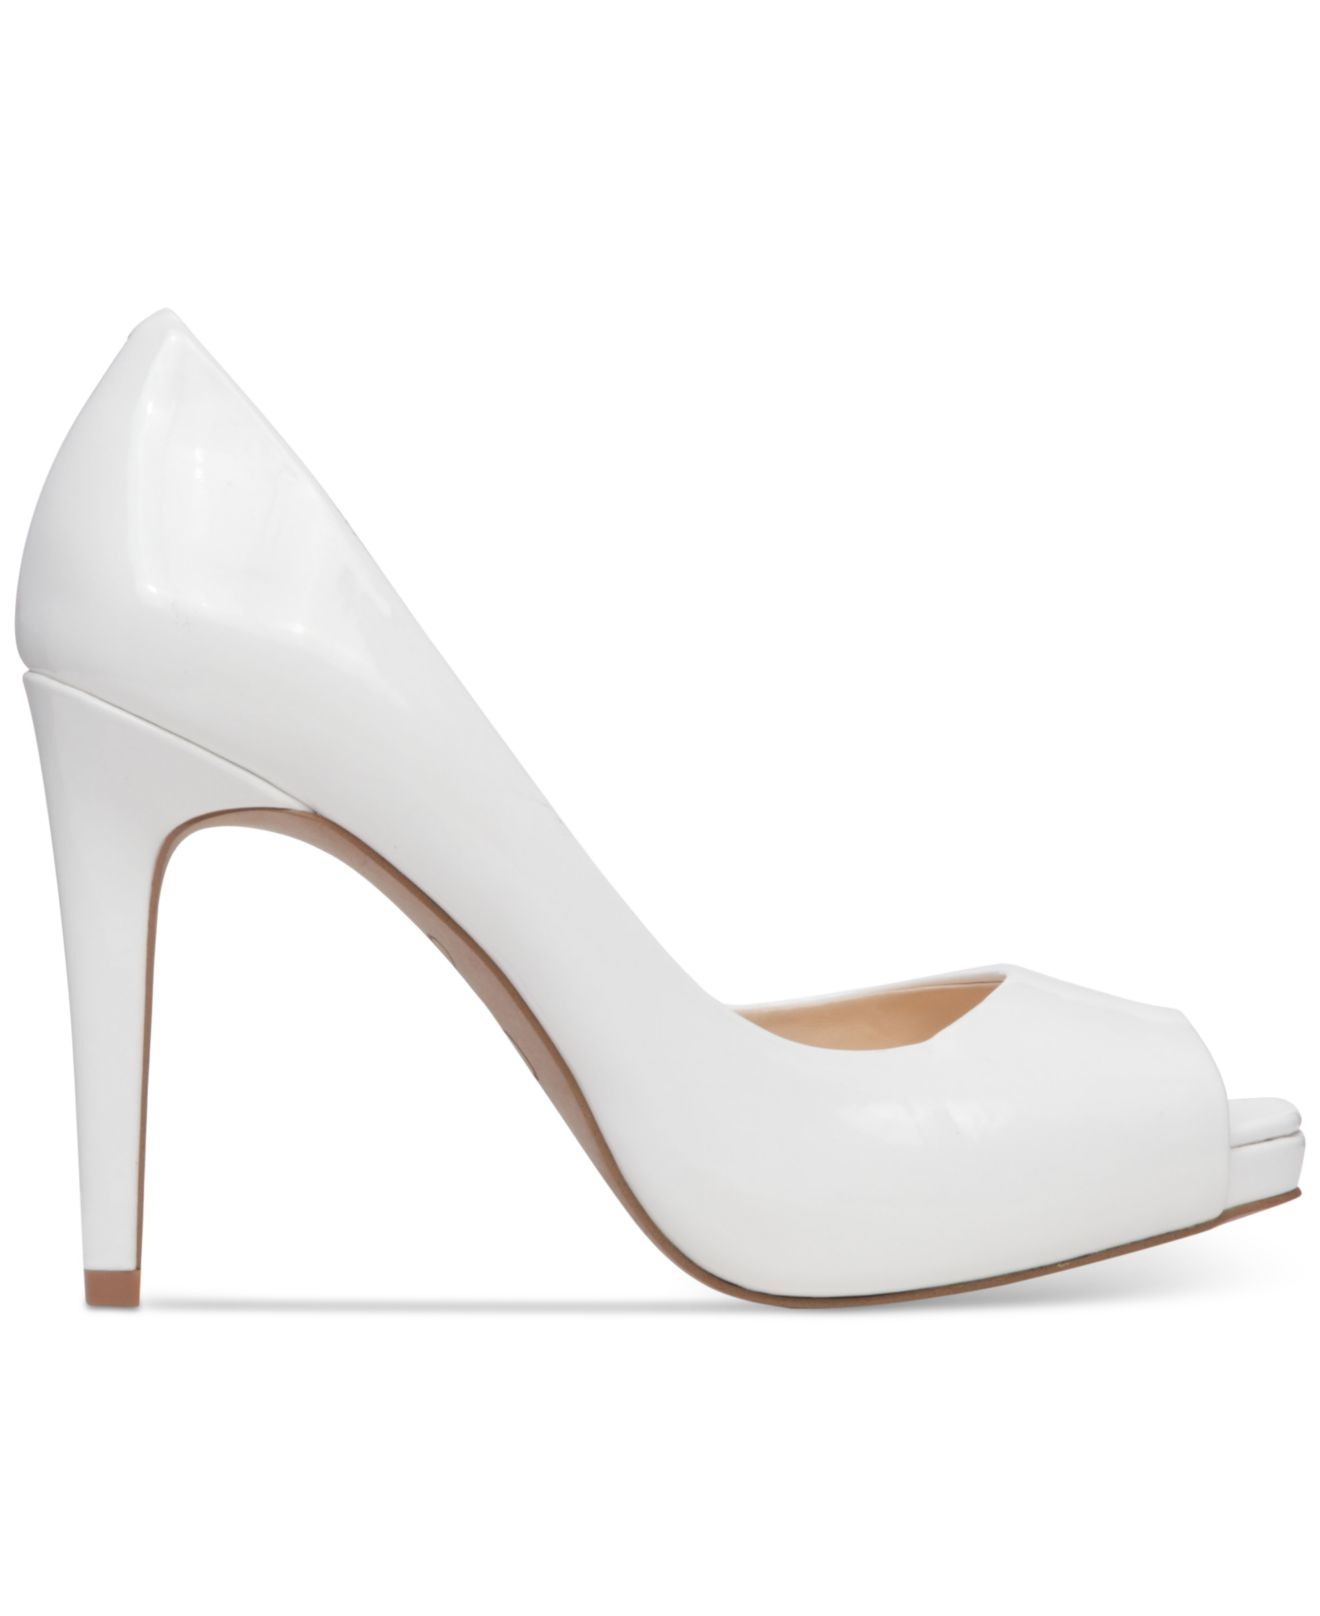 Jessica Simpson Womens JASELLE Peep Toe Dorsay Pumps Powder Size 8.0